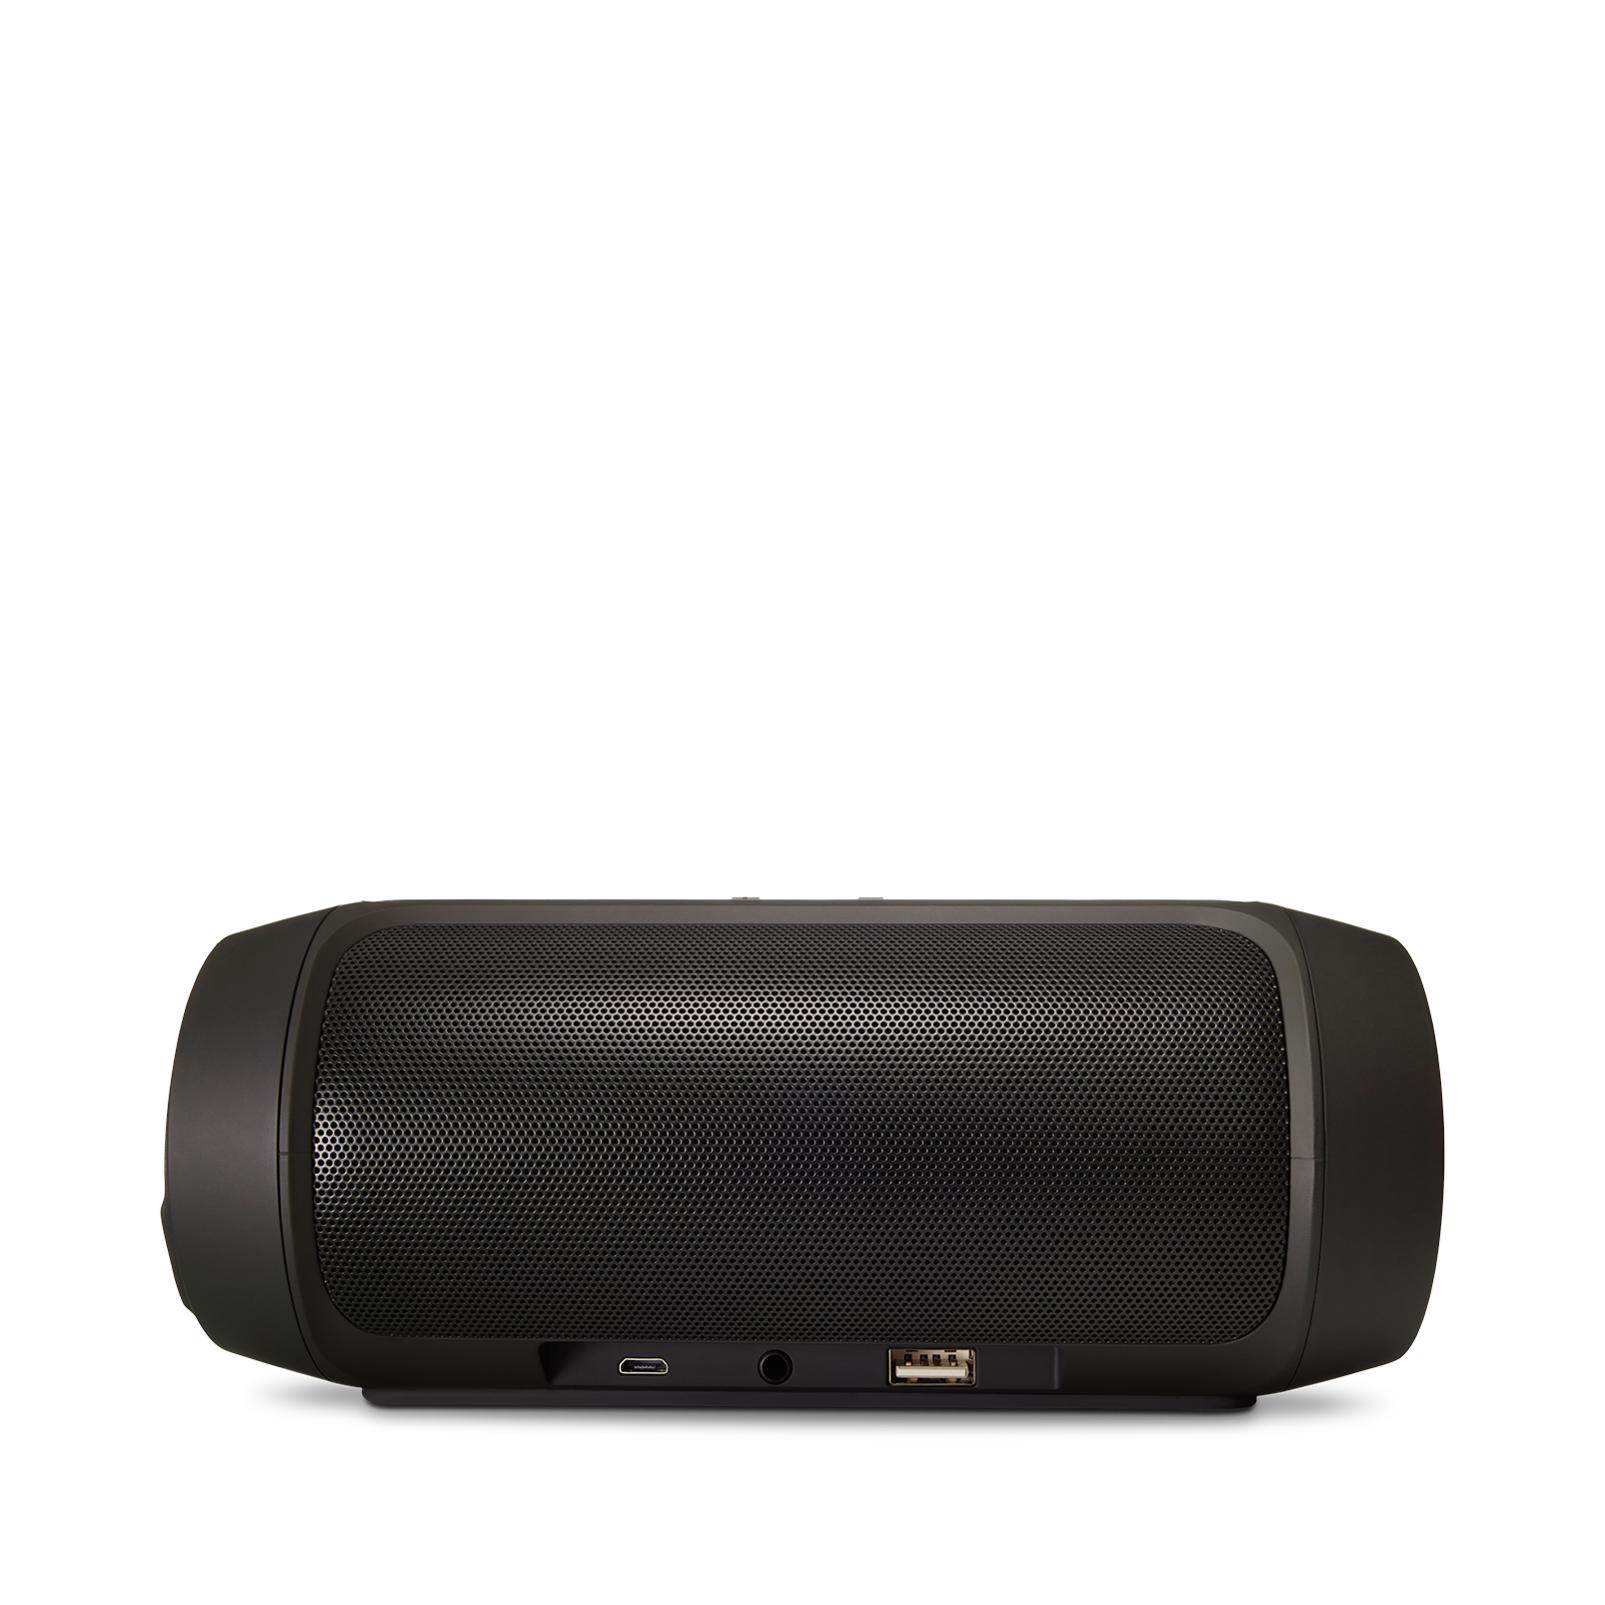 JBL Charge 2+ - Black - Splashproof Bluetooth Speaker with Powerful Bass - Back